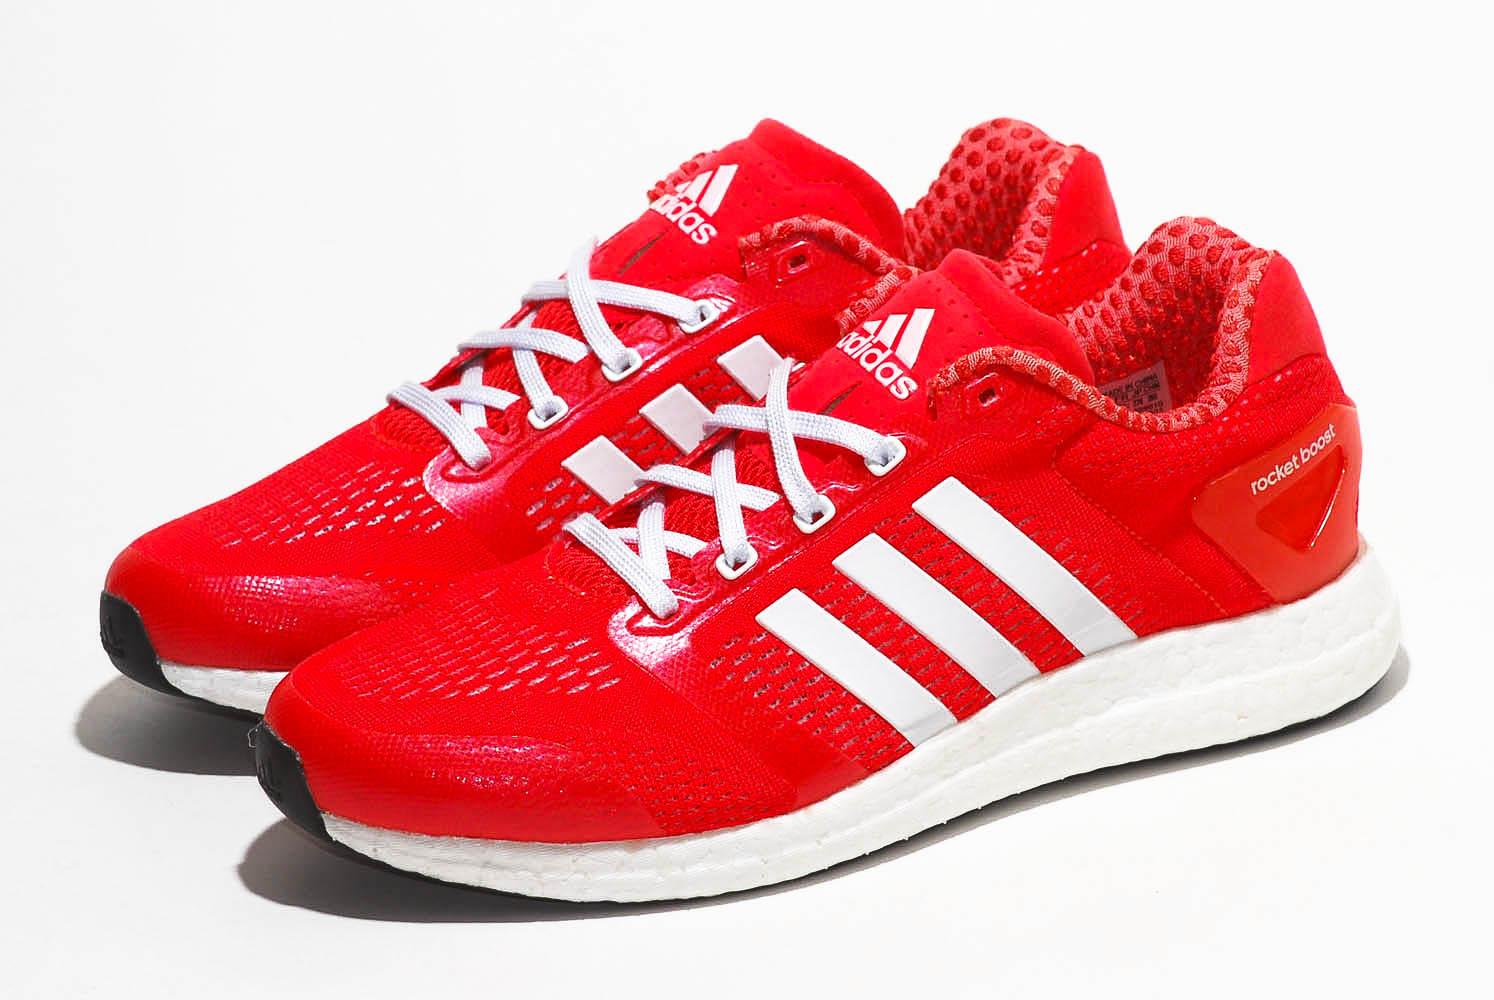 Adidas climachill rosso